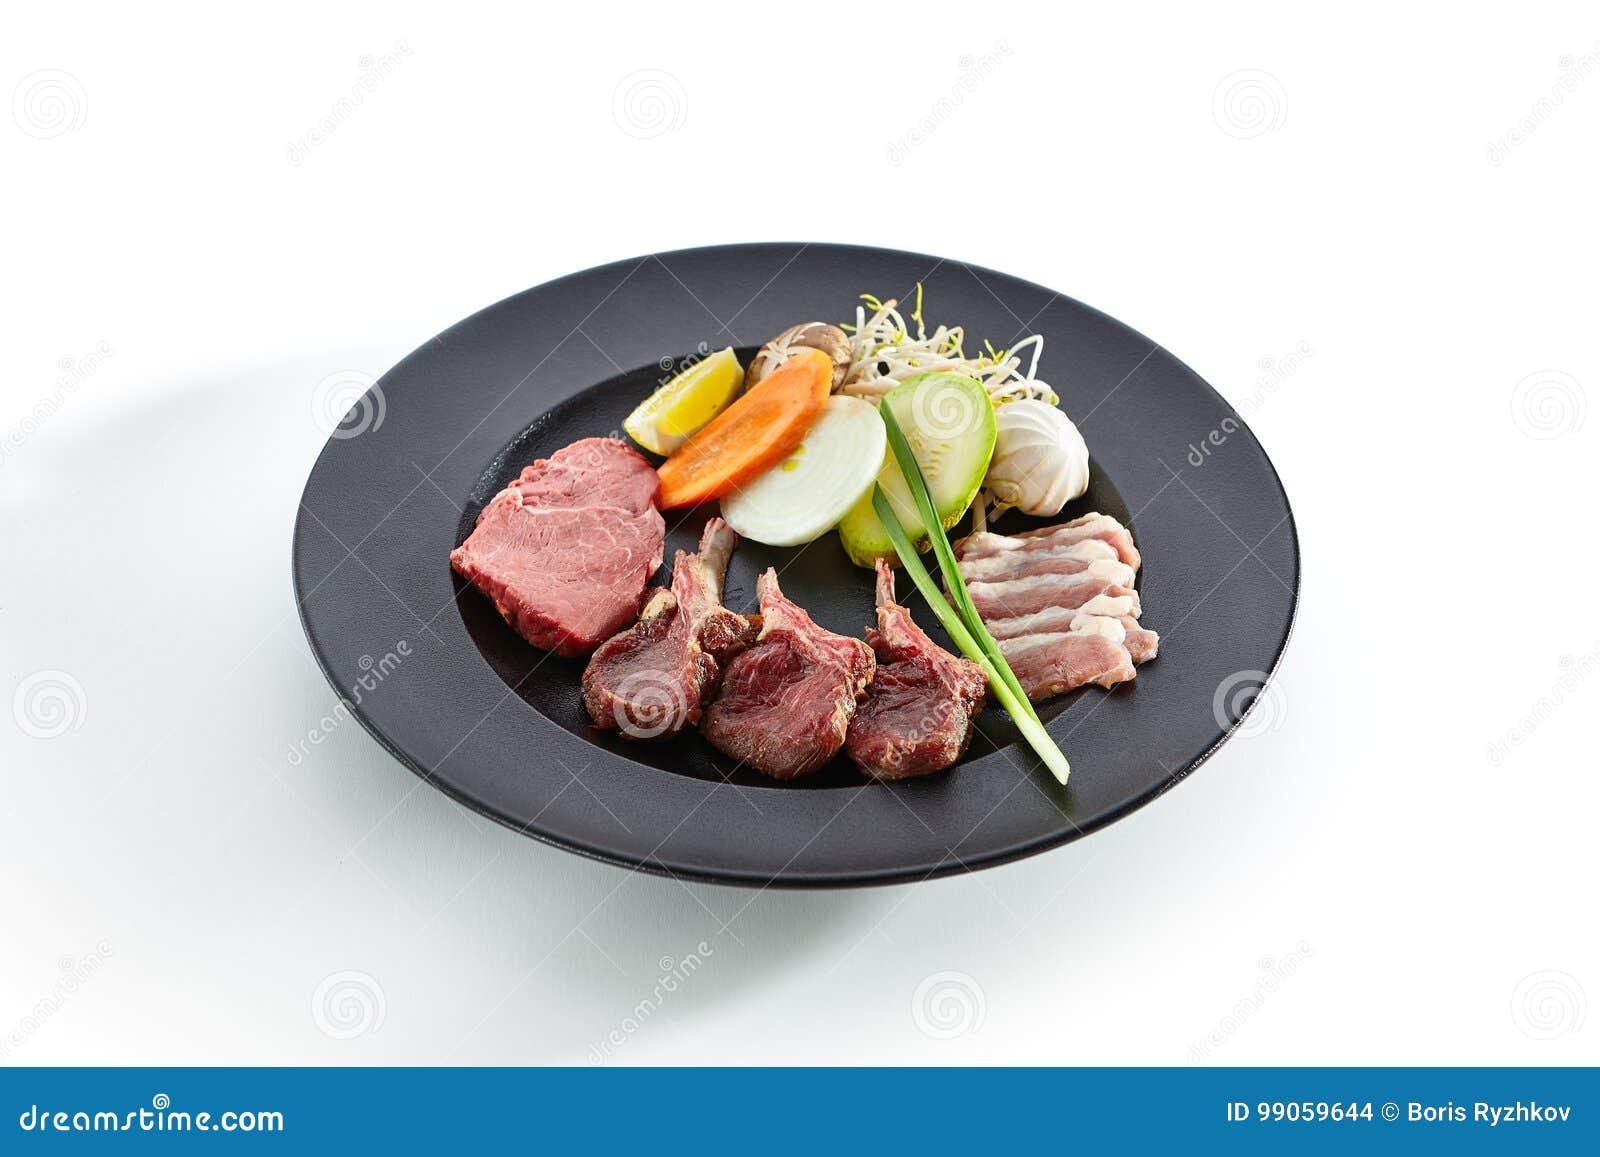 Teppanyaki Japanese And Korean Grill Meat Stock Photo - Image of ...